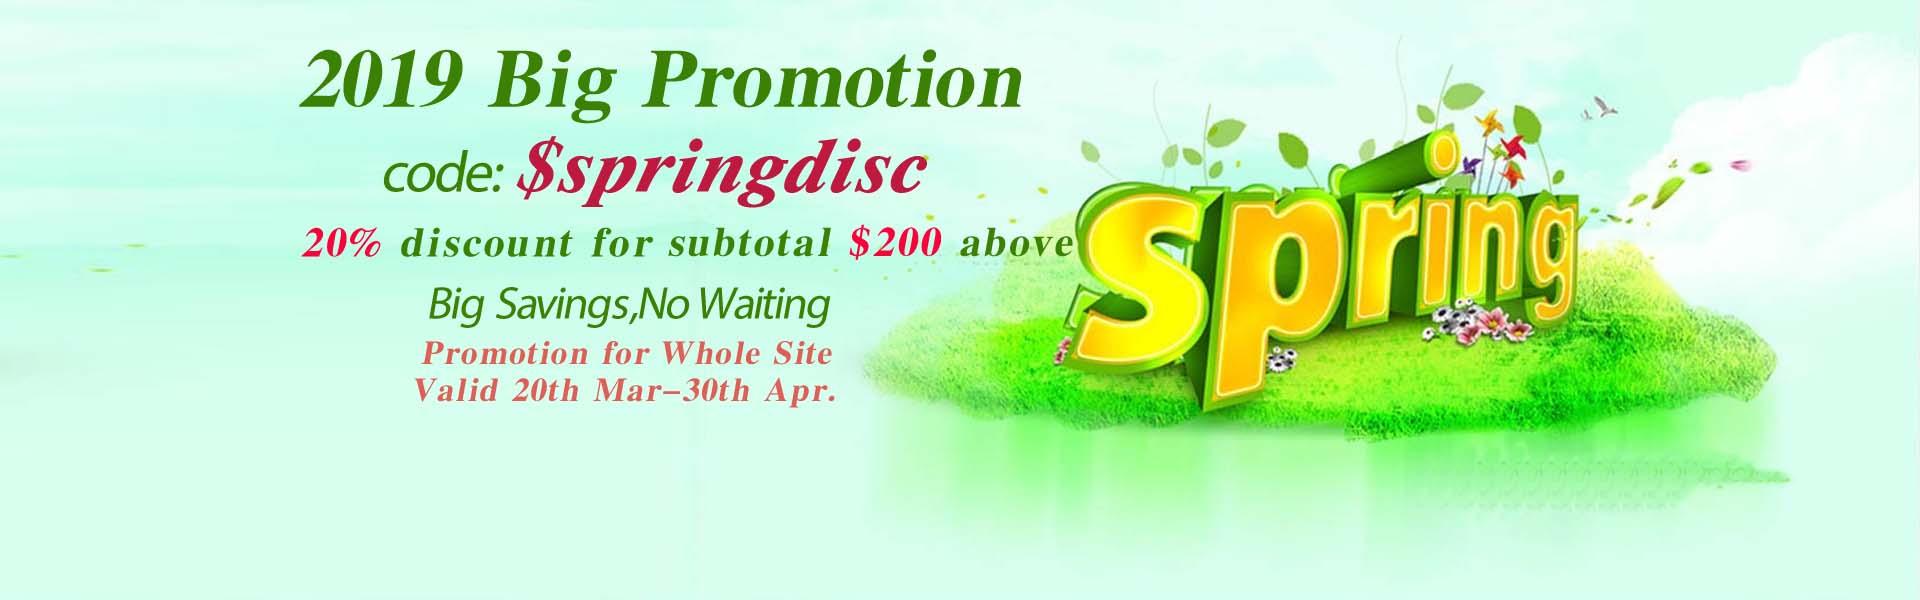 promotion 2019 Spring